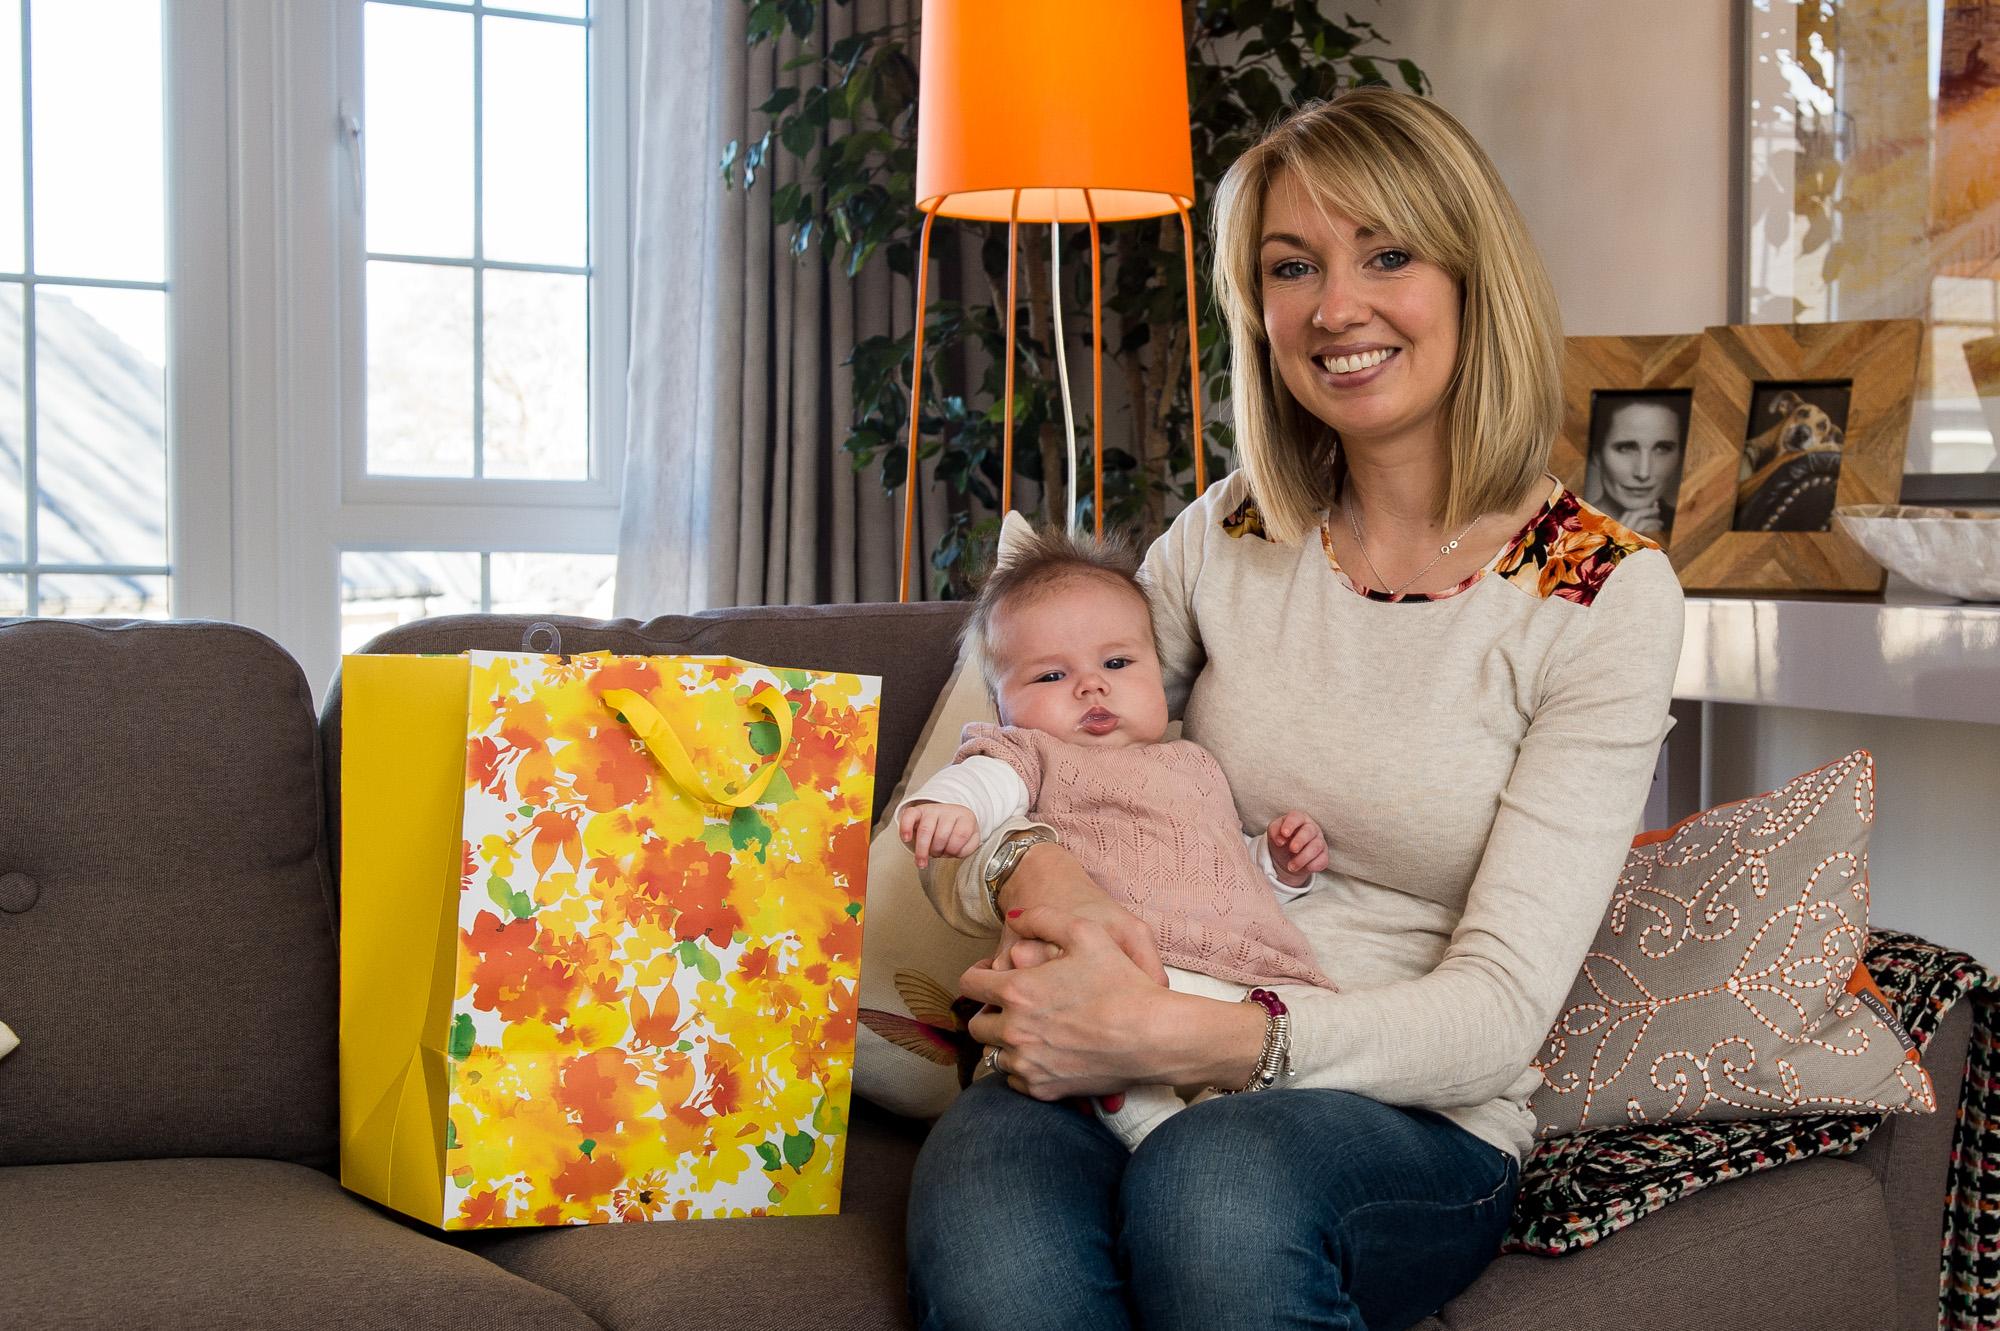 Cala Craigpark newborn babies - Nicola Gillan with baby Esme for Pr Photography